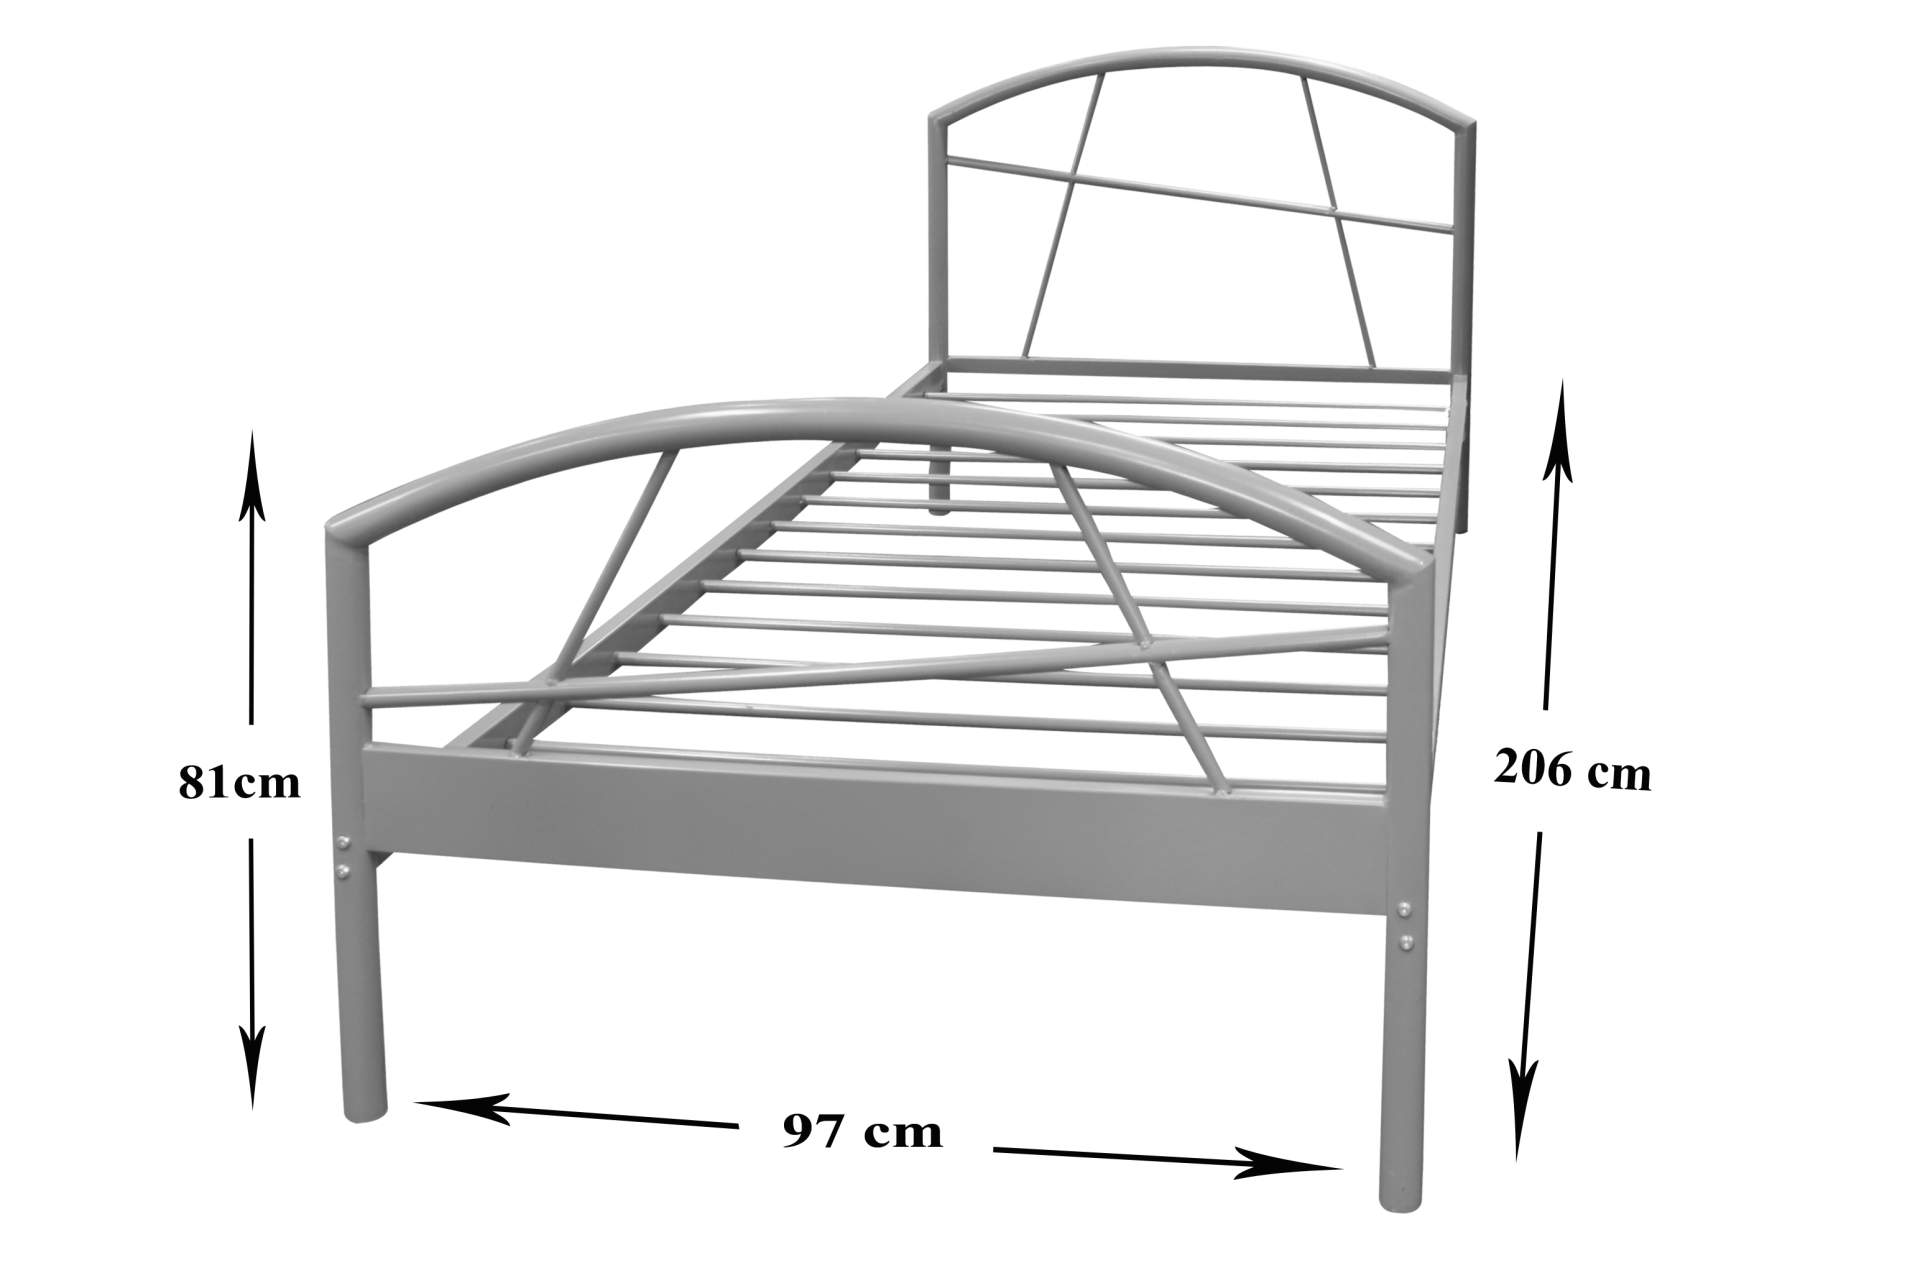 metall bettgestell susi grau 90 x 200 cm schlafzimmer m bel metallbett neu ebay. Black Bedroom Furniture Sets. Home Design Ideas